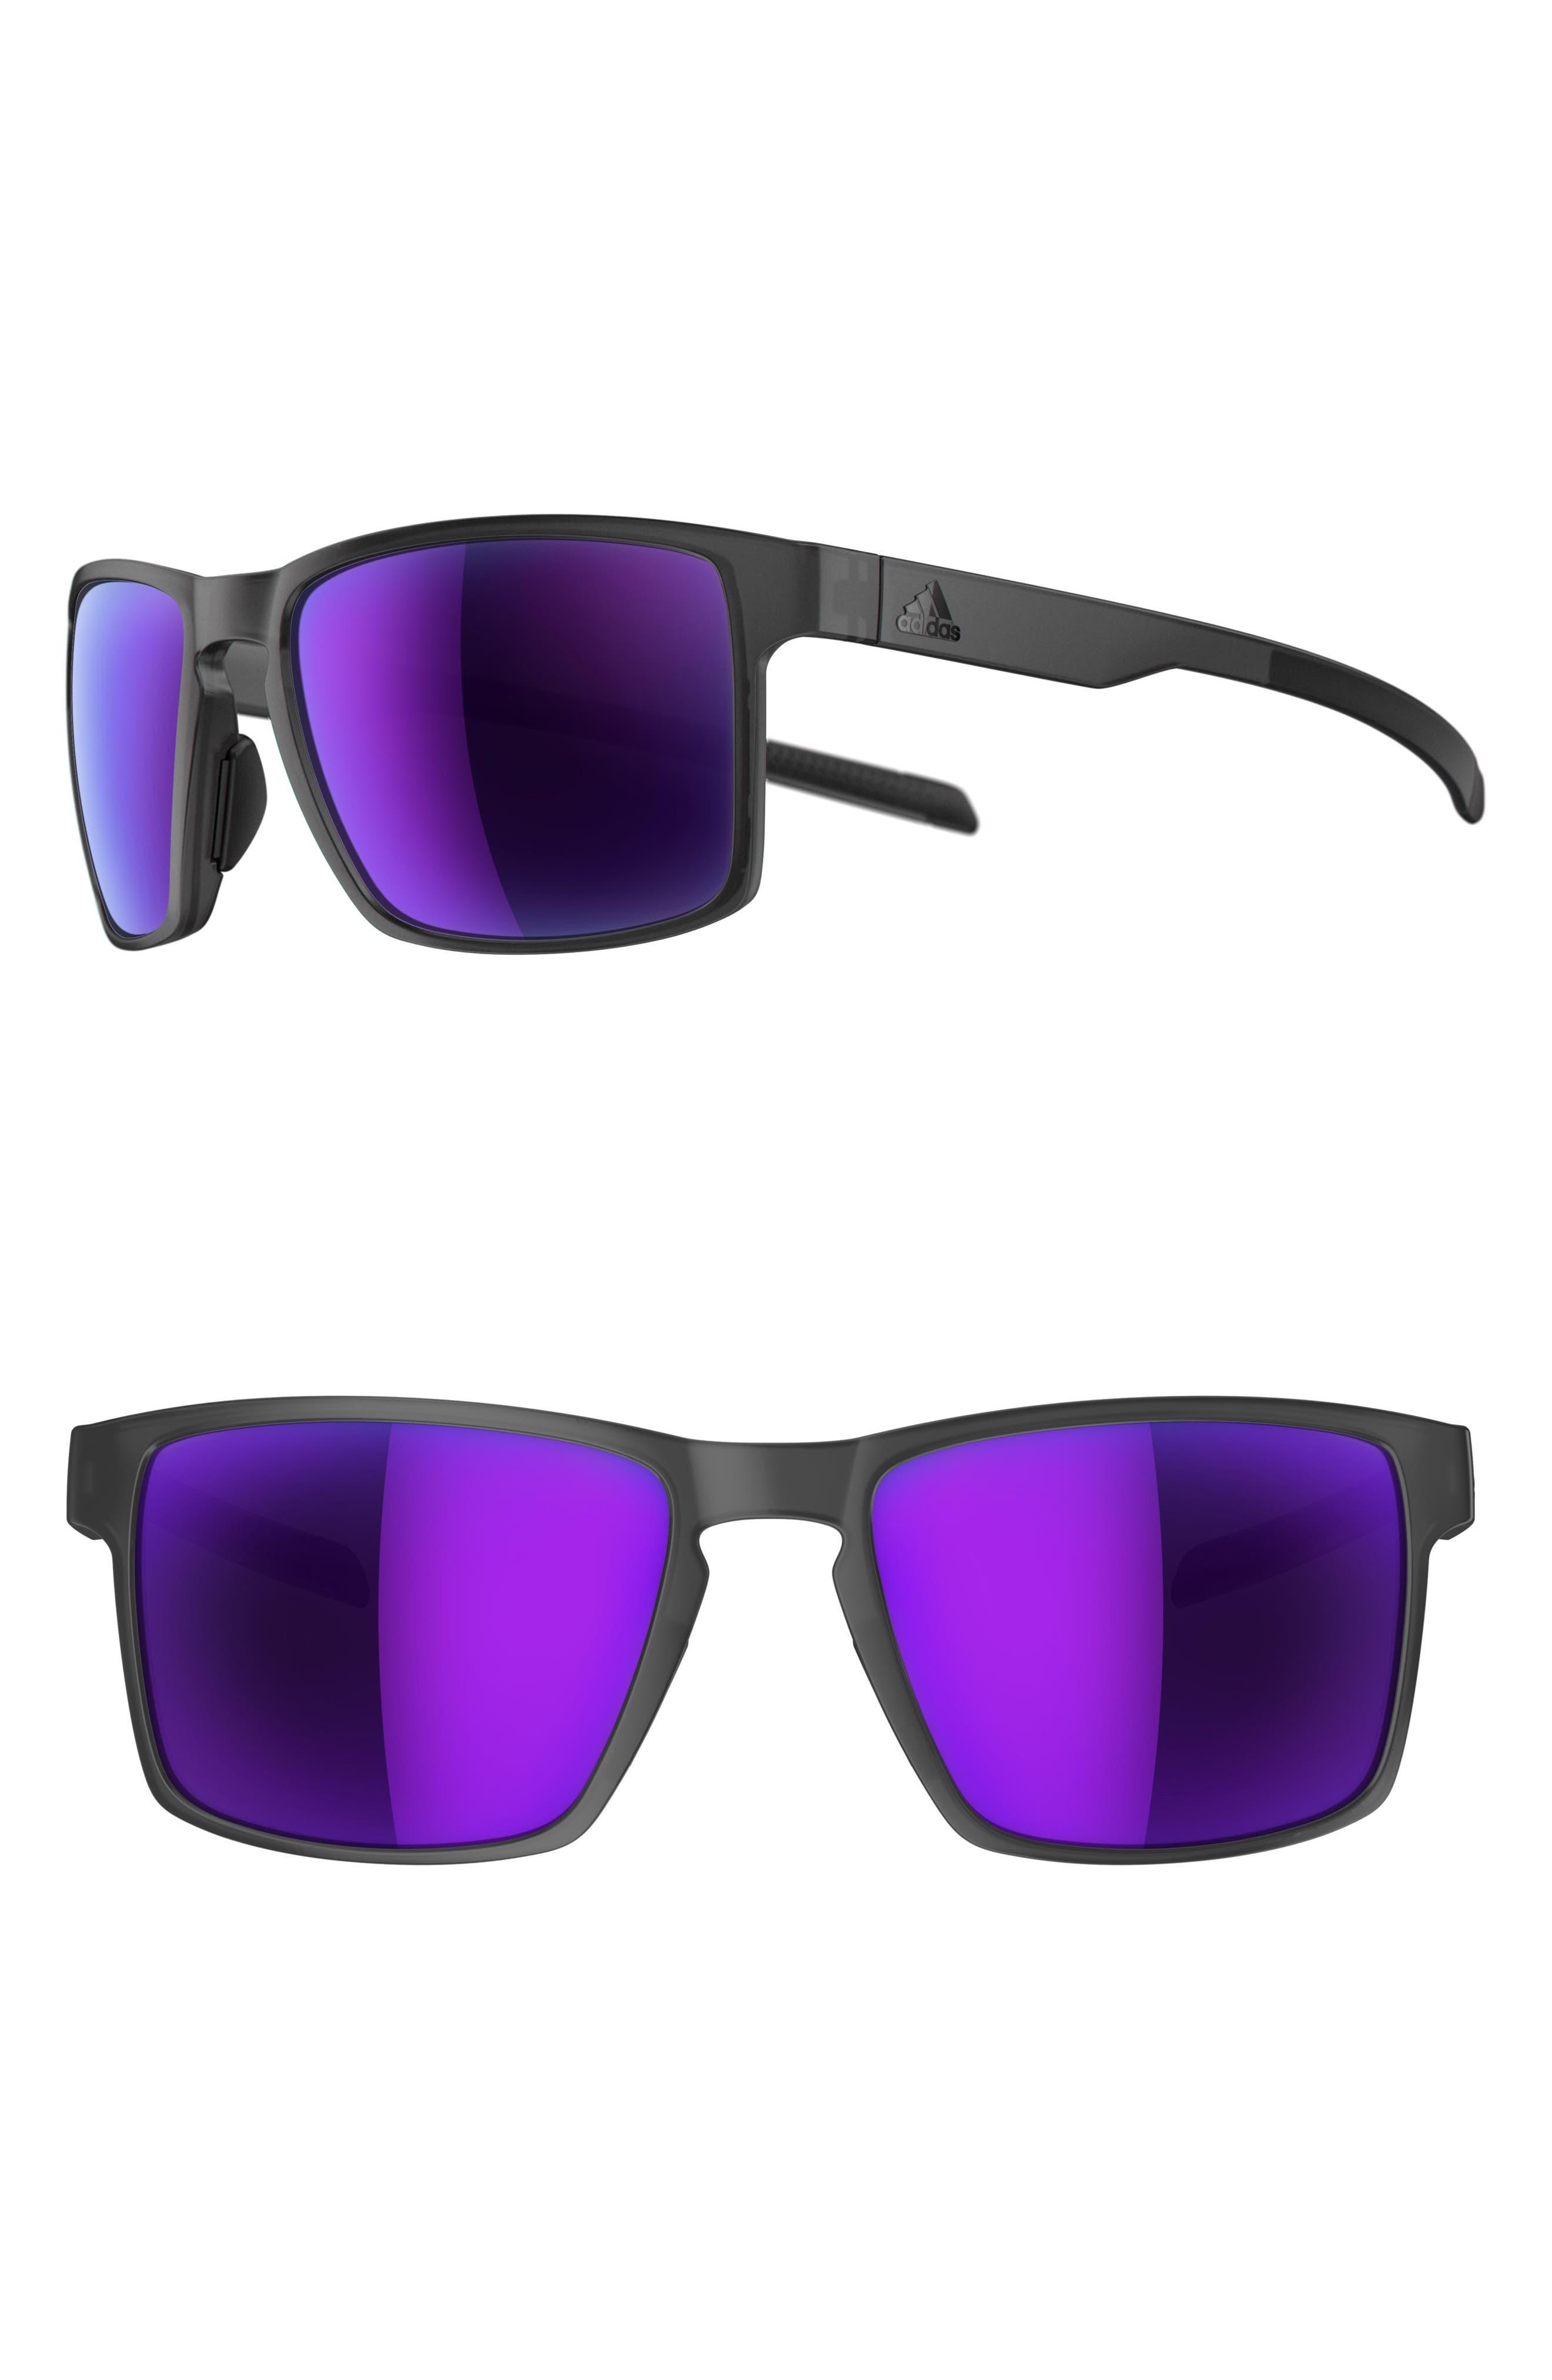 Wayfinder 56mm Mirrored Sport Sunglasses,                         Main,                         color, MATTE COAL/ VIOLA